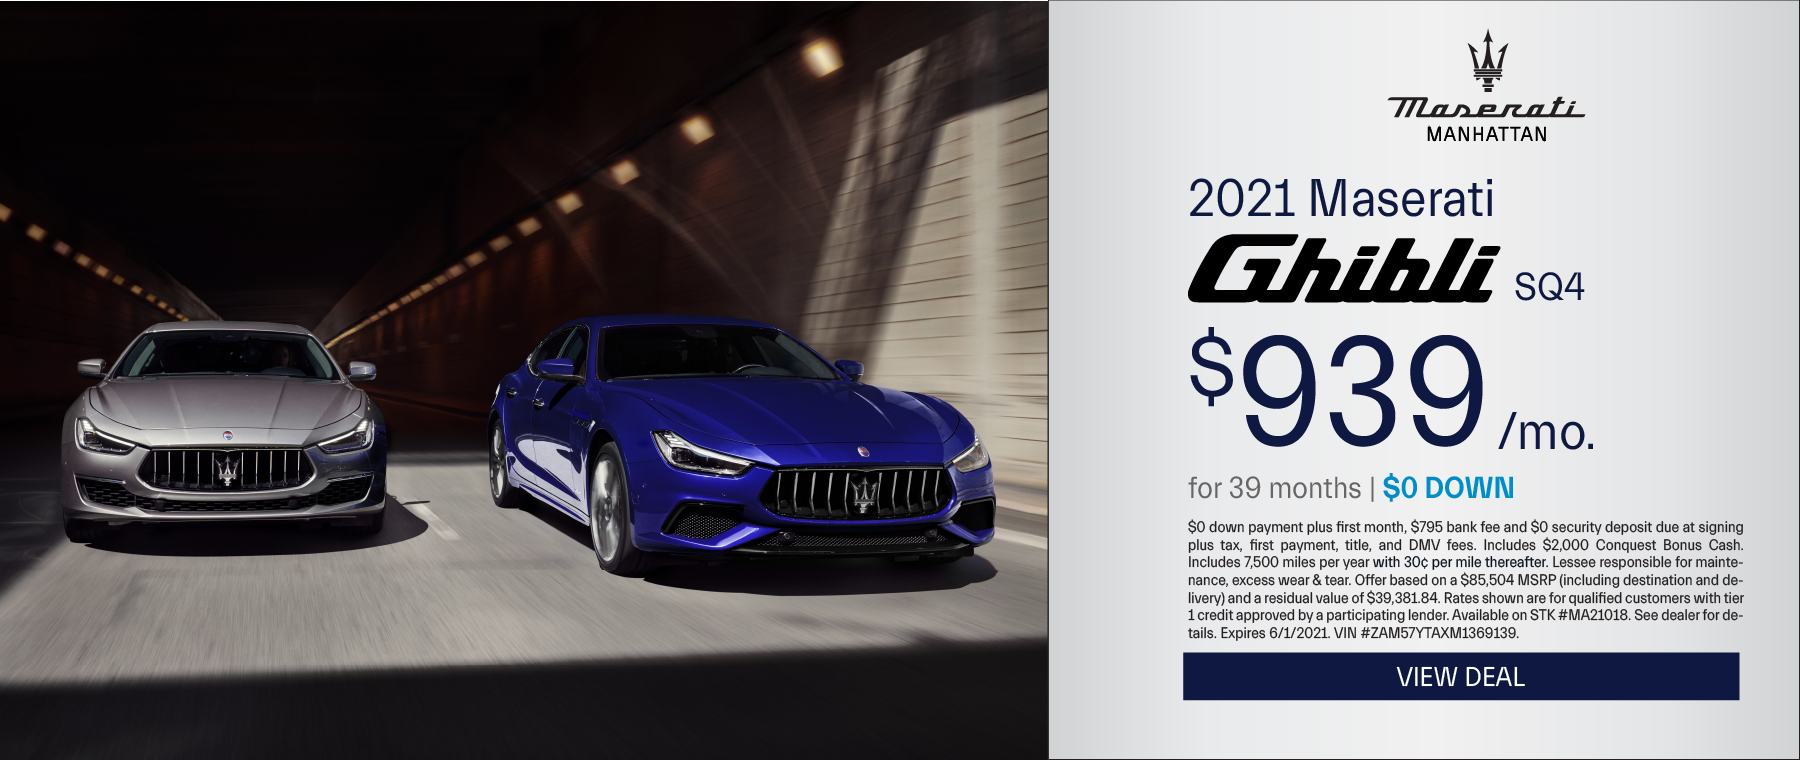 Maserati of Manhattan – 2021 Ghibli – May 2021